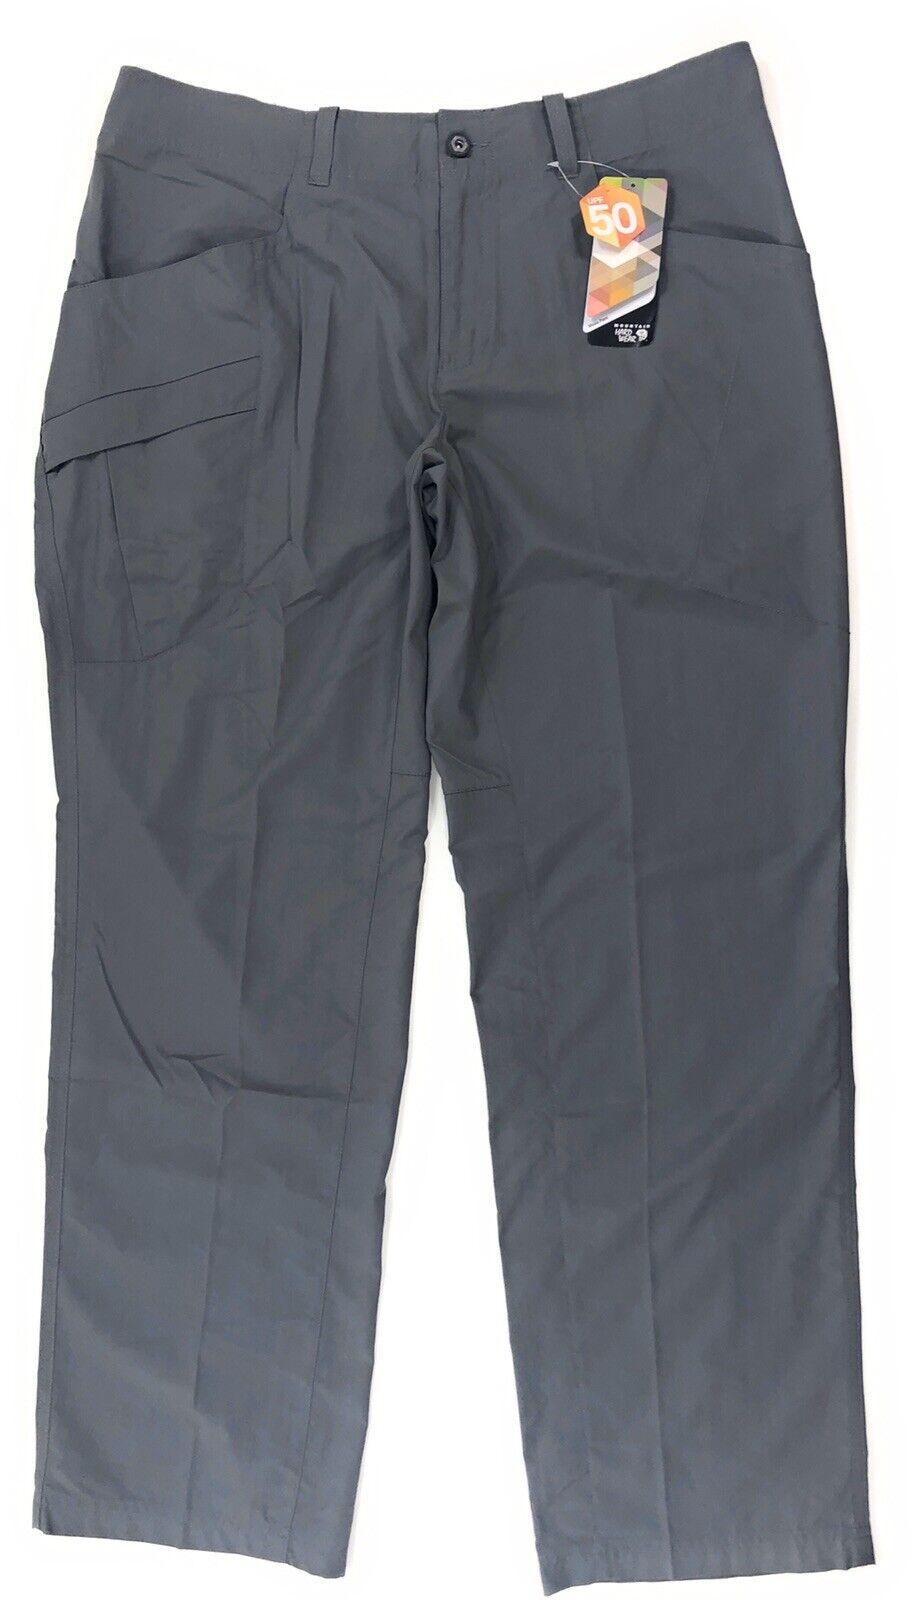 Mountain Hardwear Mesa Pants V2 Mens 36x32 Outdoor Hiking Cl